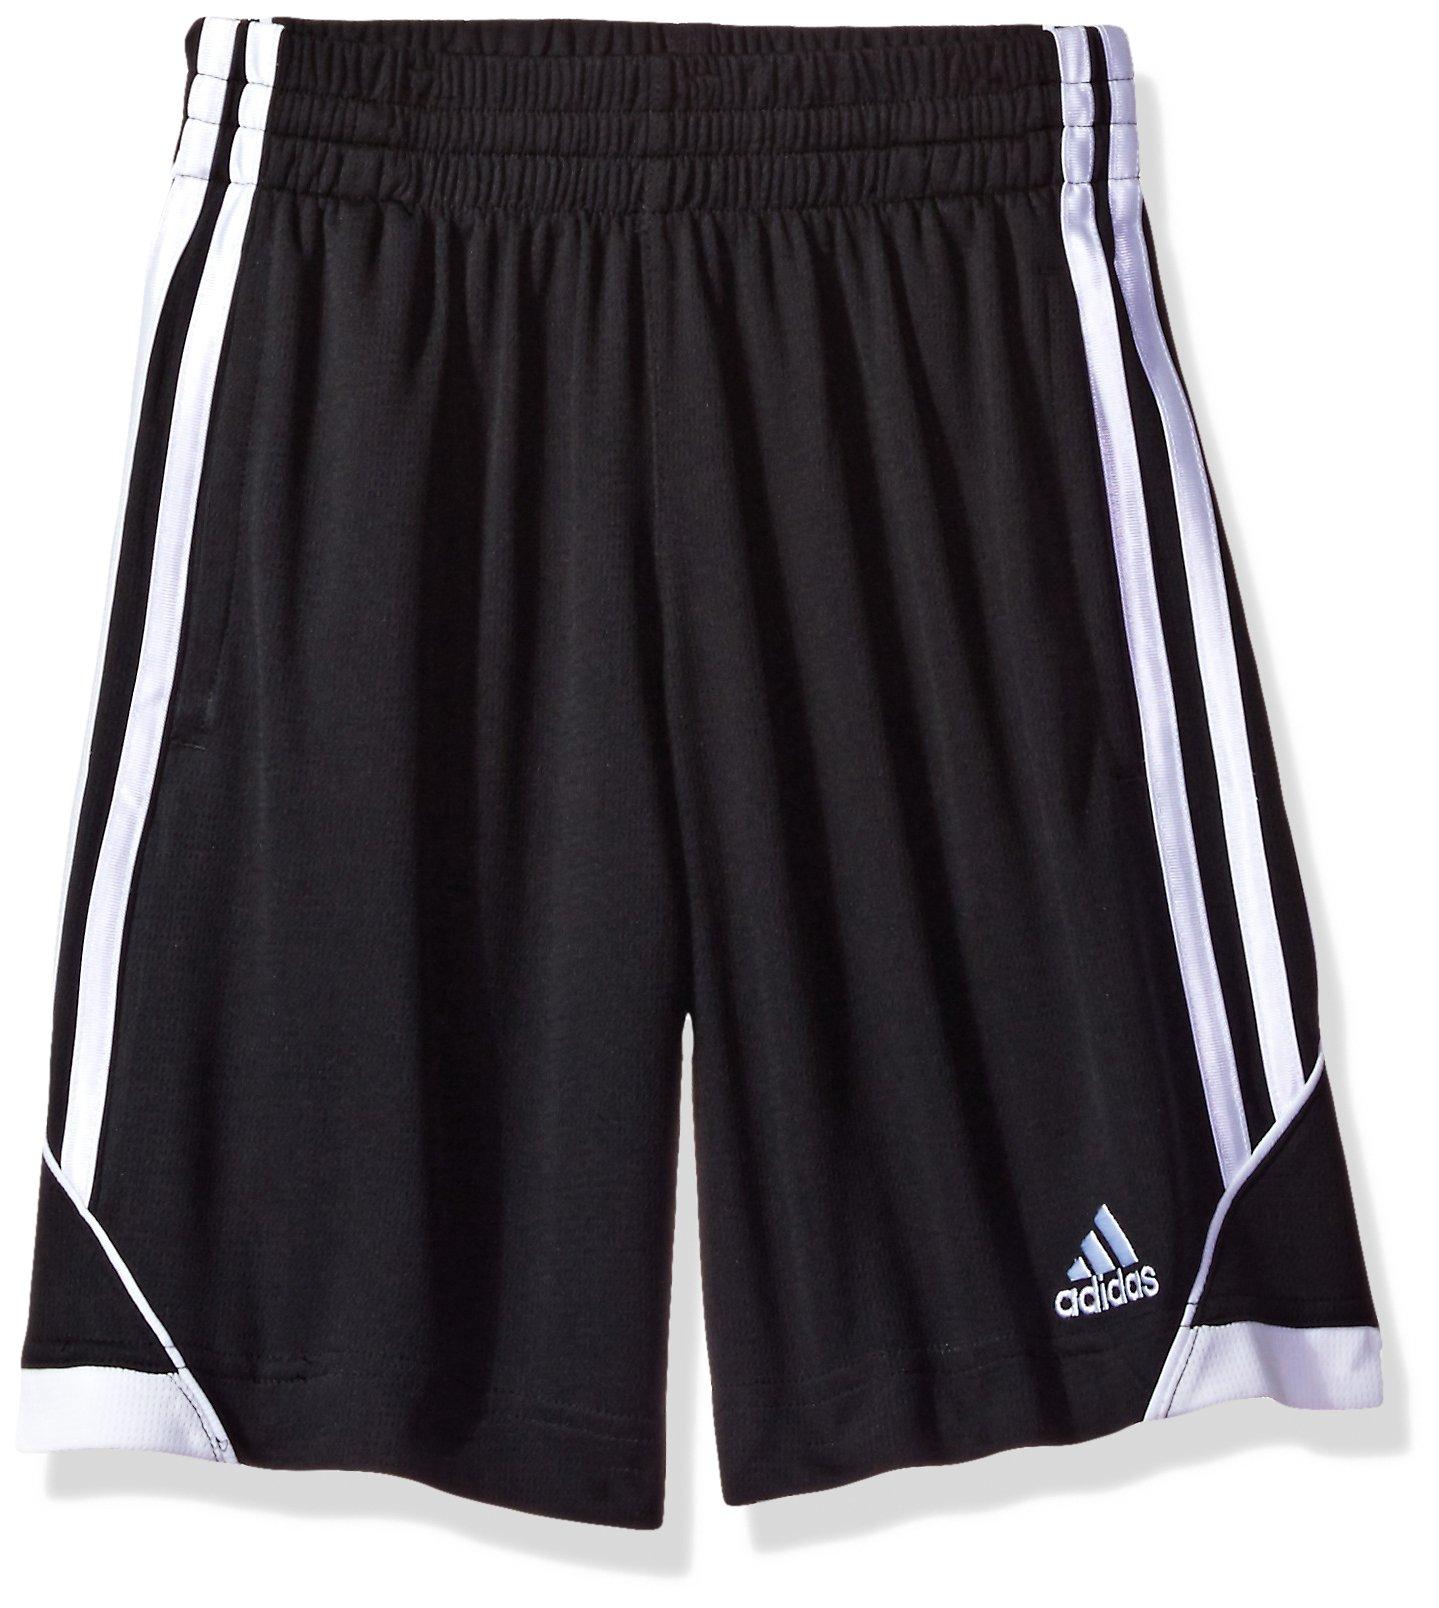 Adidas Boys' Little Athletic Short, Caviar Black, 6